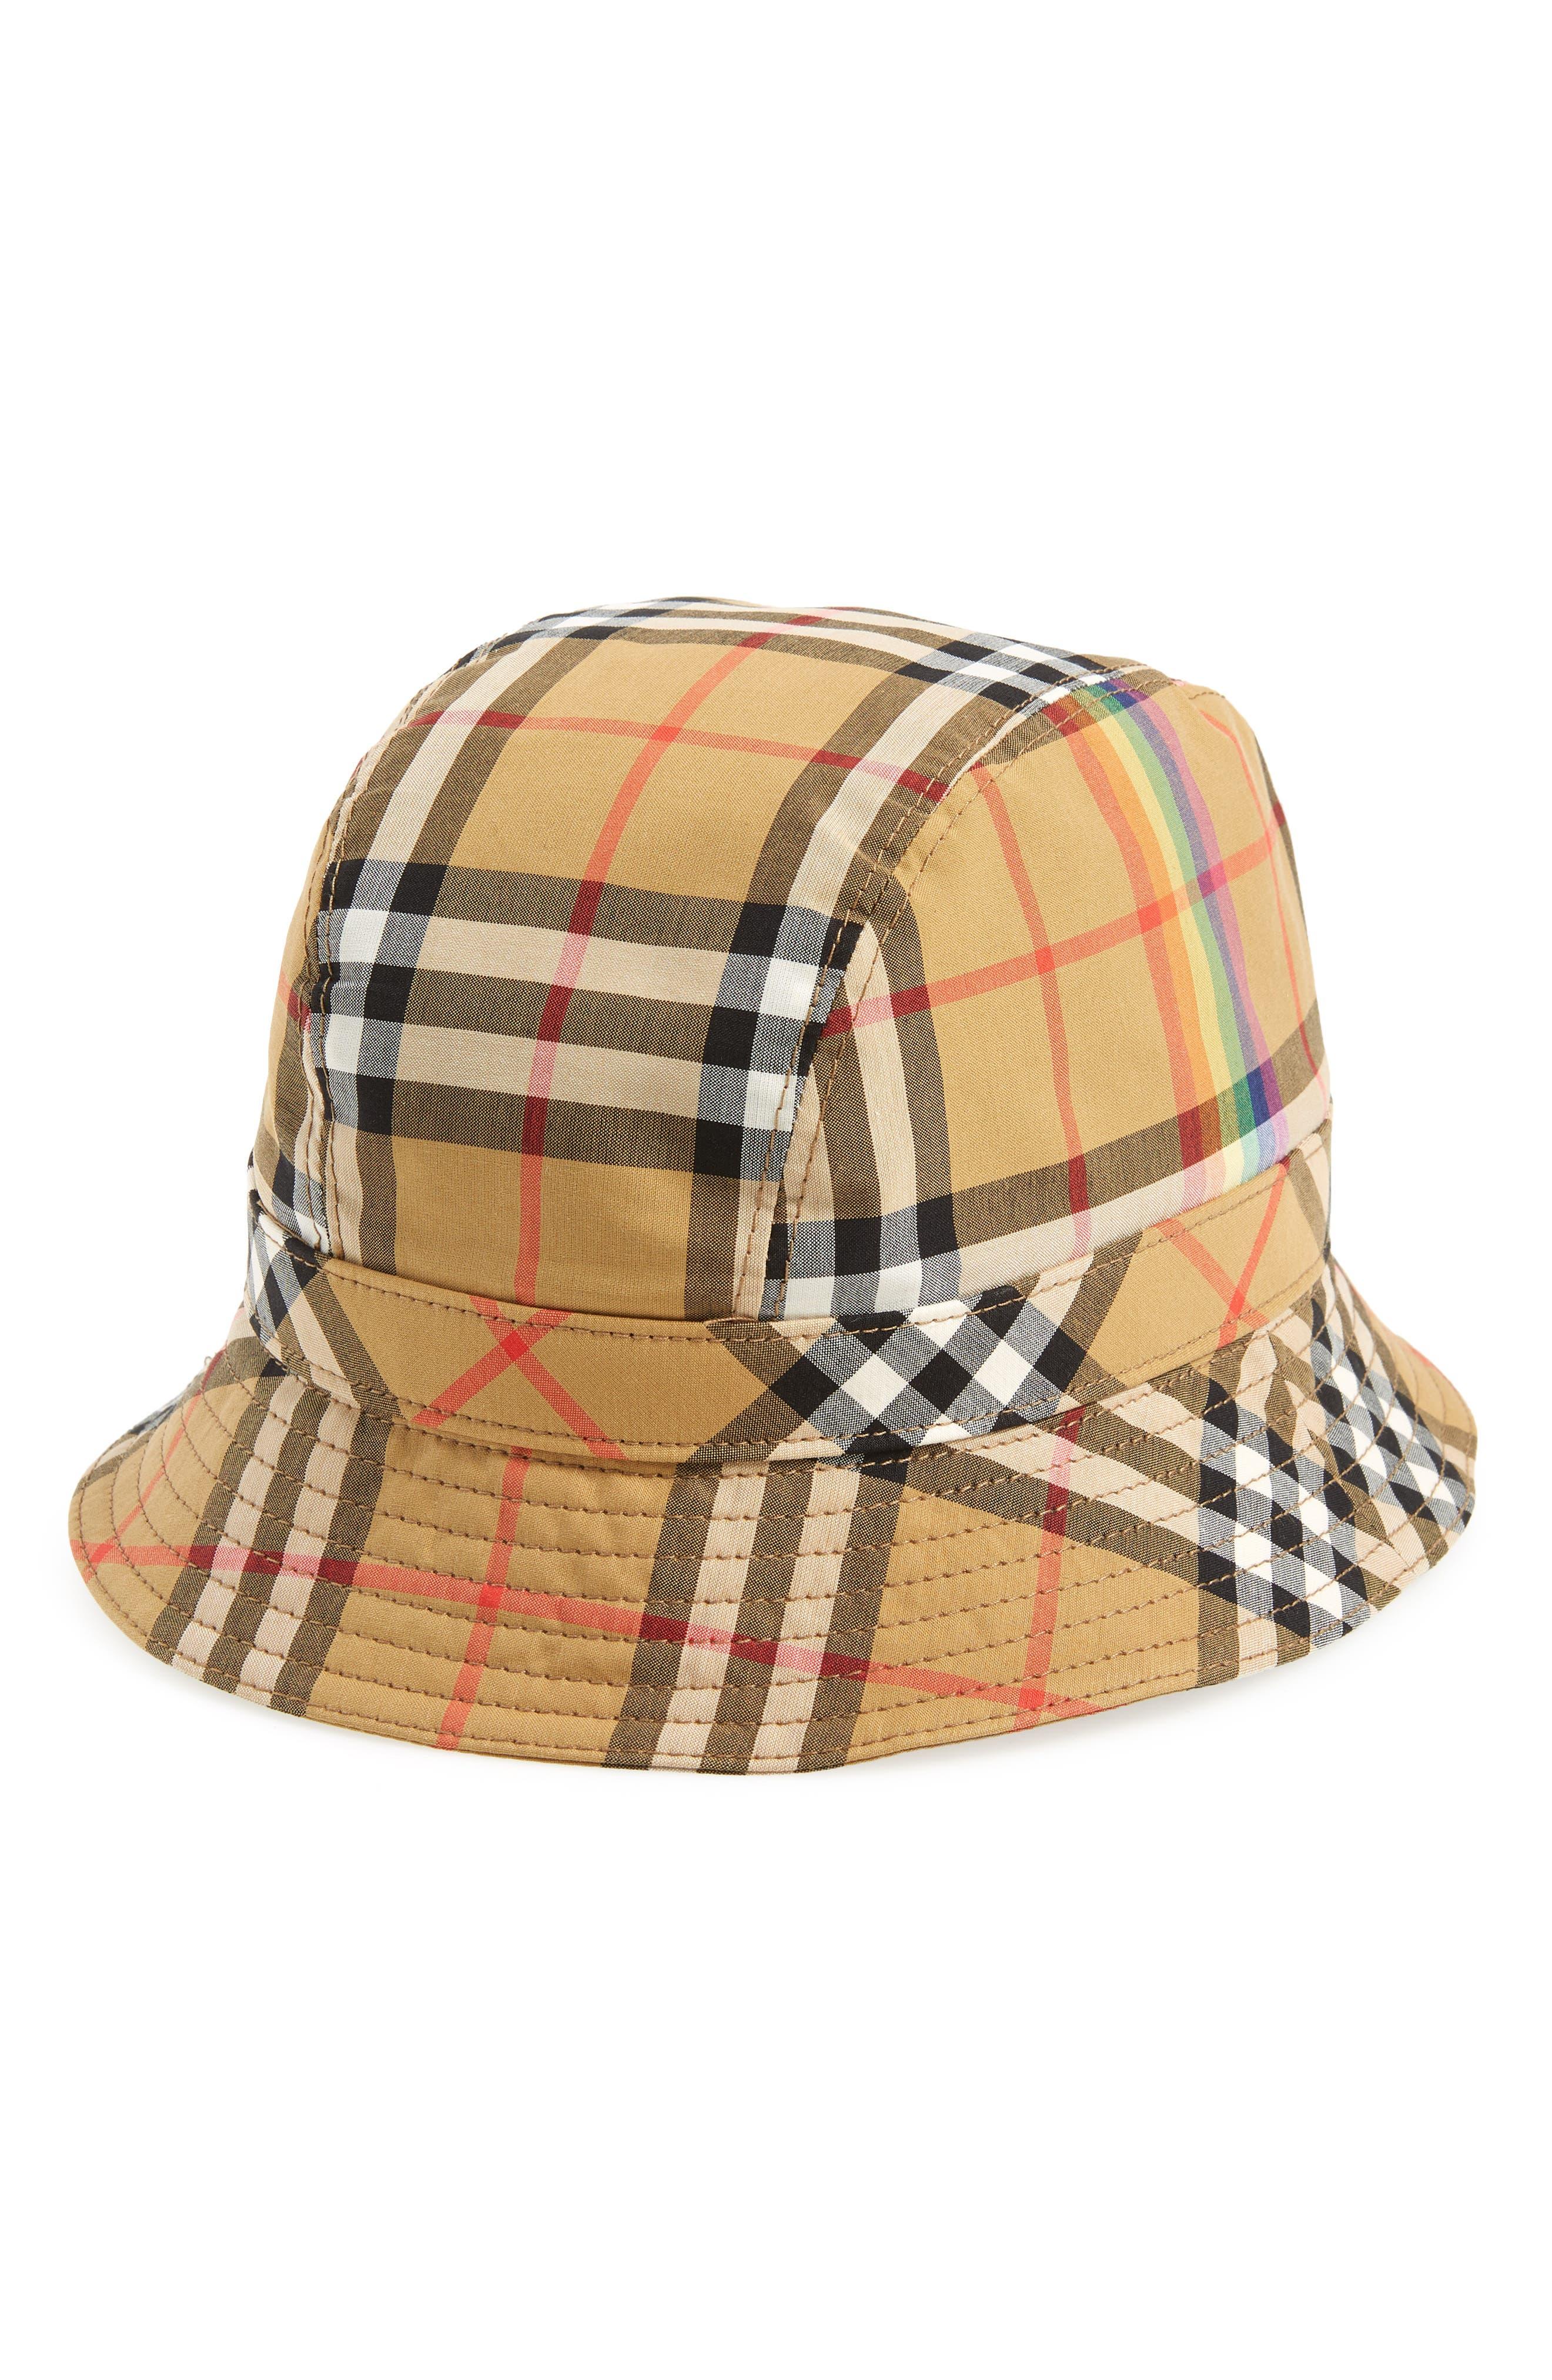 Rainbow Stripe Vintage Check Bucket Hat,                         Main,                         color, ANTIQUE YELLOW/ RAINBOW